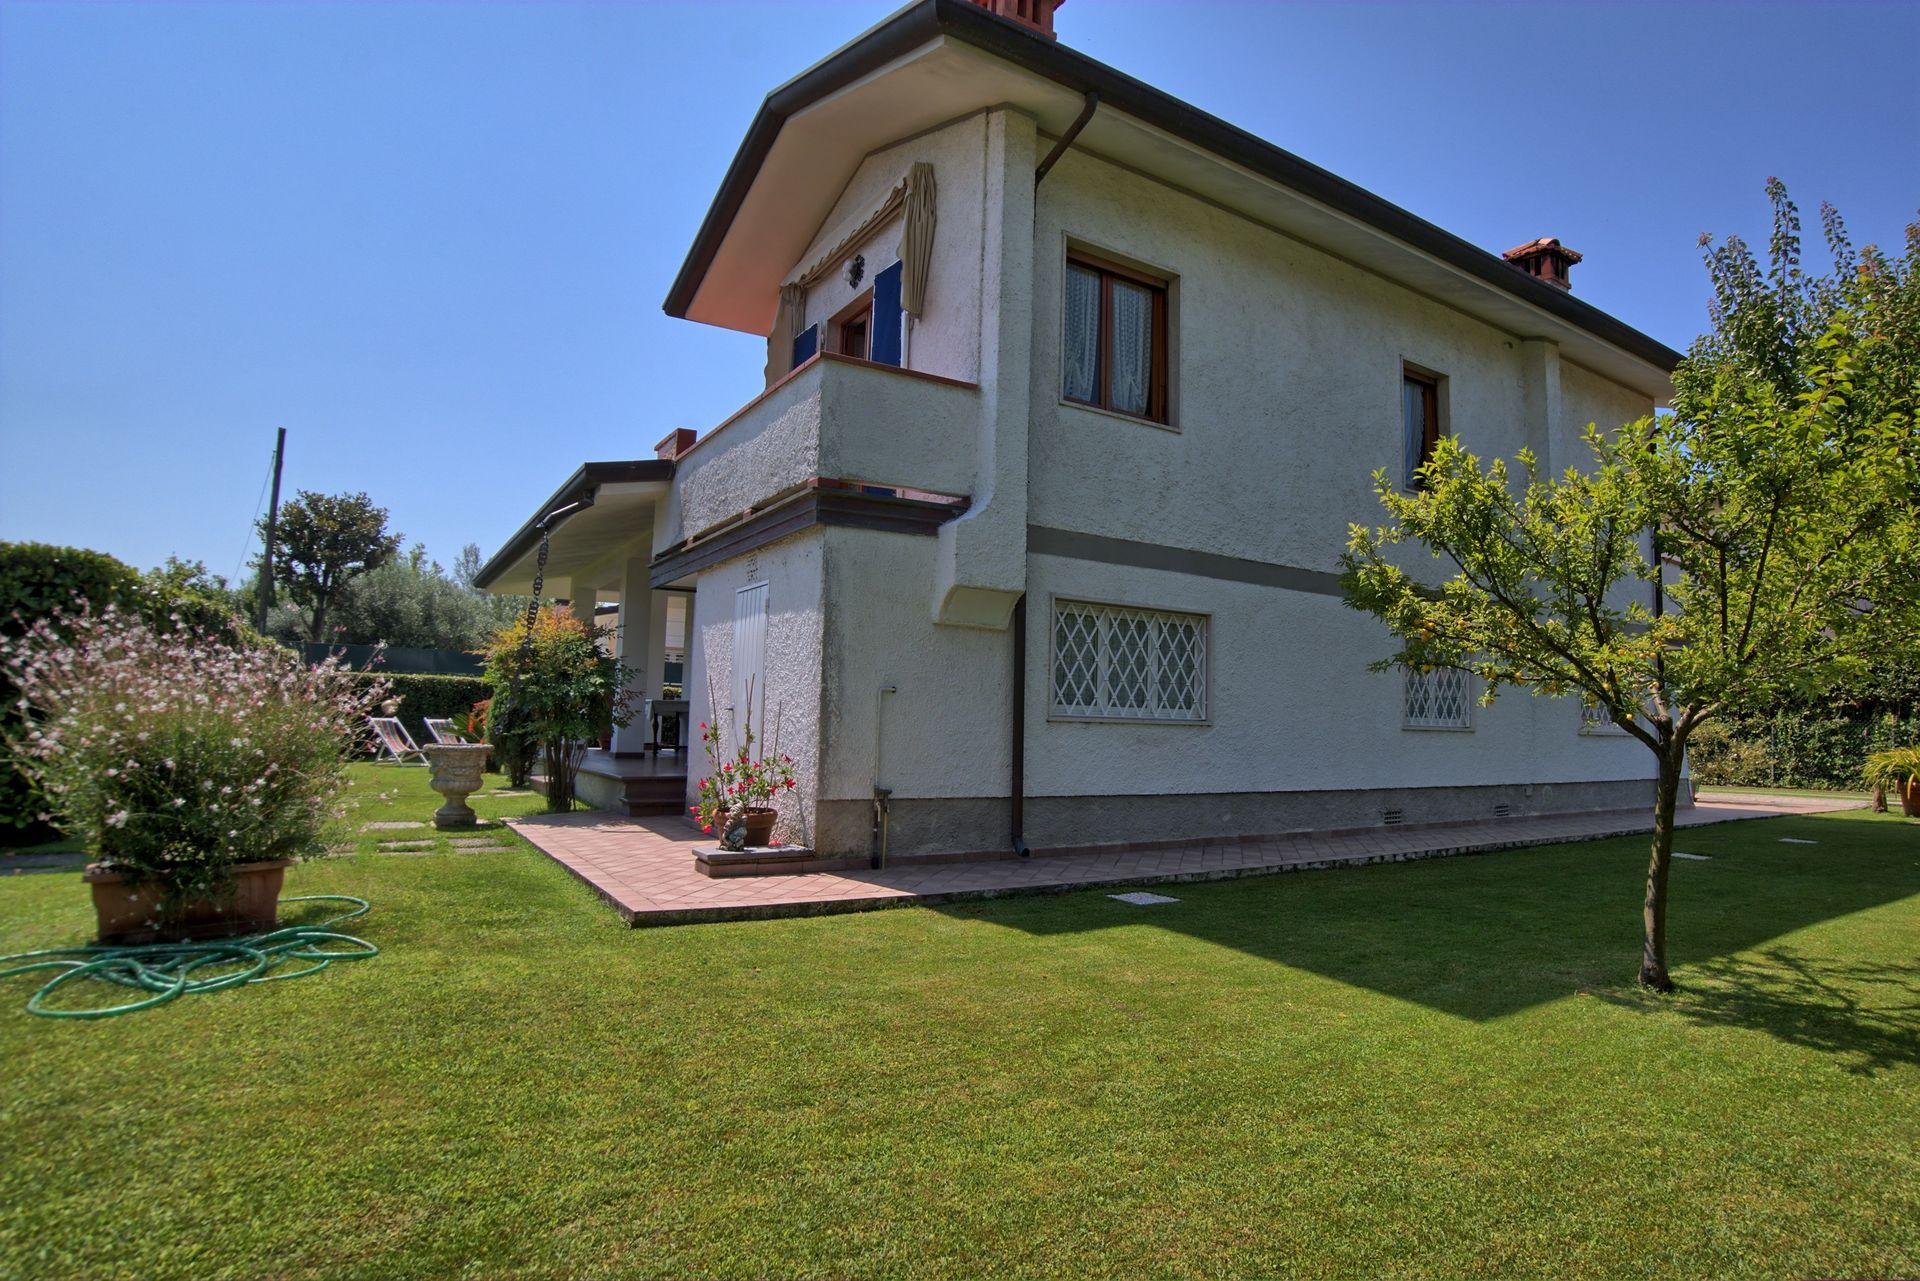 Villa Carla location de vacances - Couchages 5 dans 3 chambres